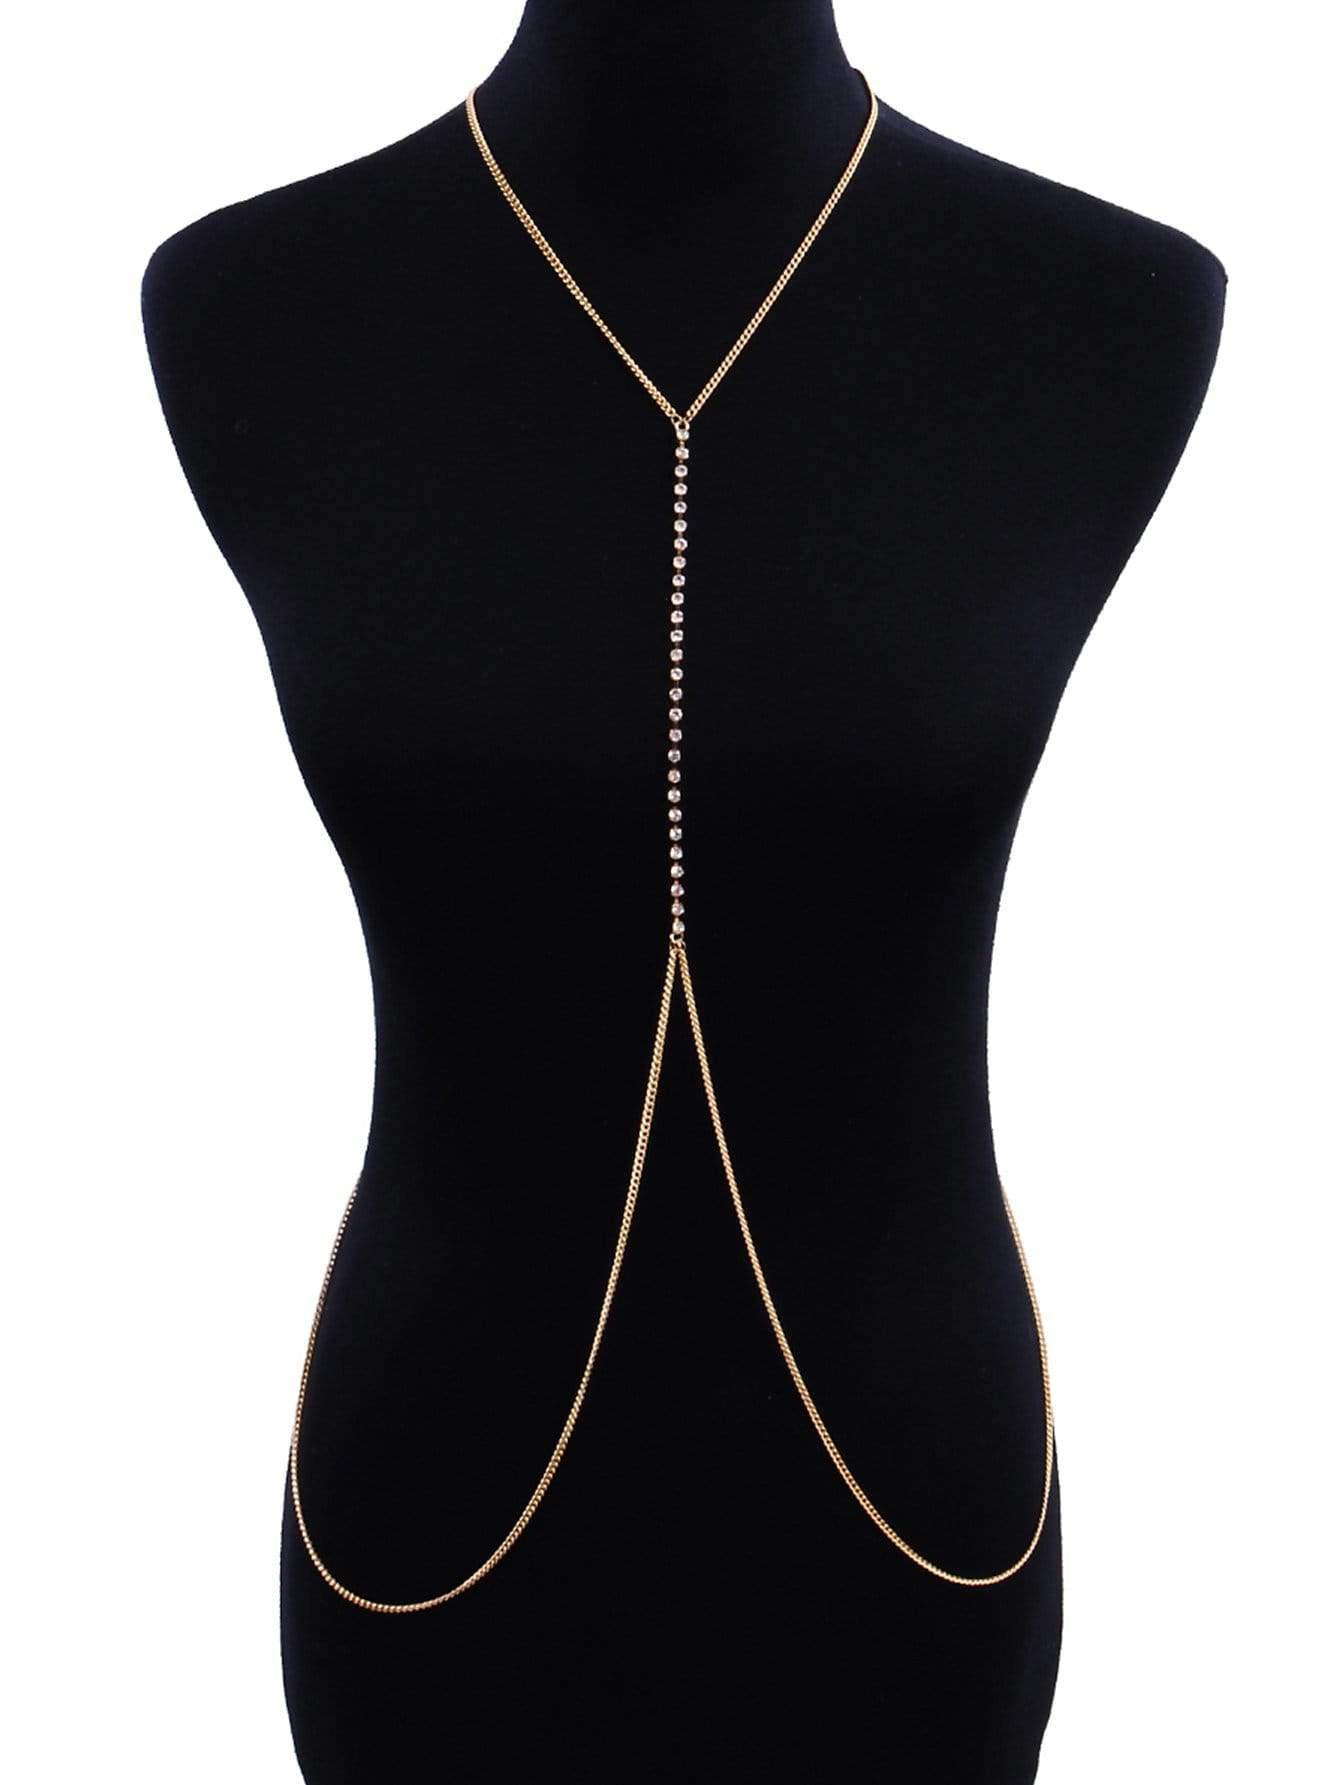 Beaded Body Jewelry  Bead Detail Body Chain